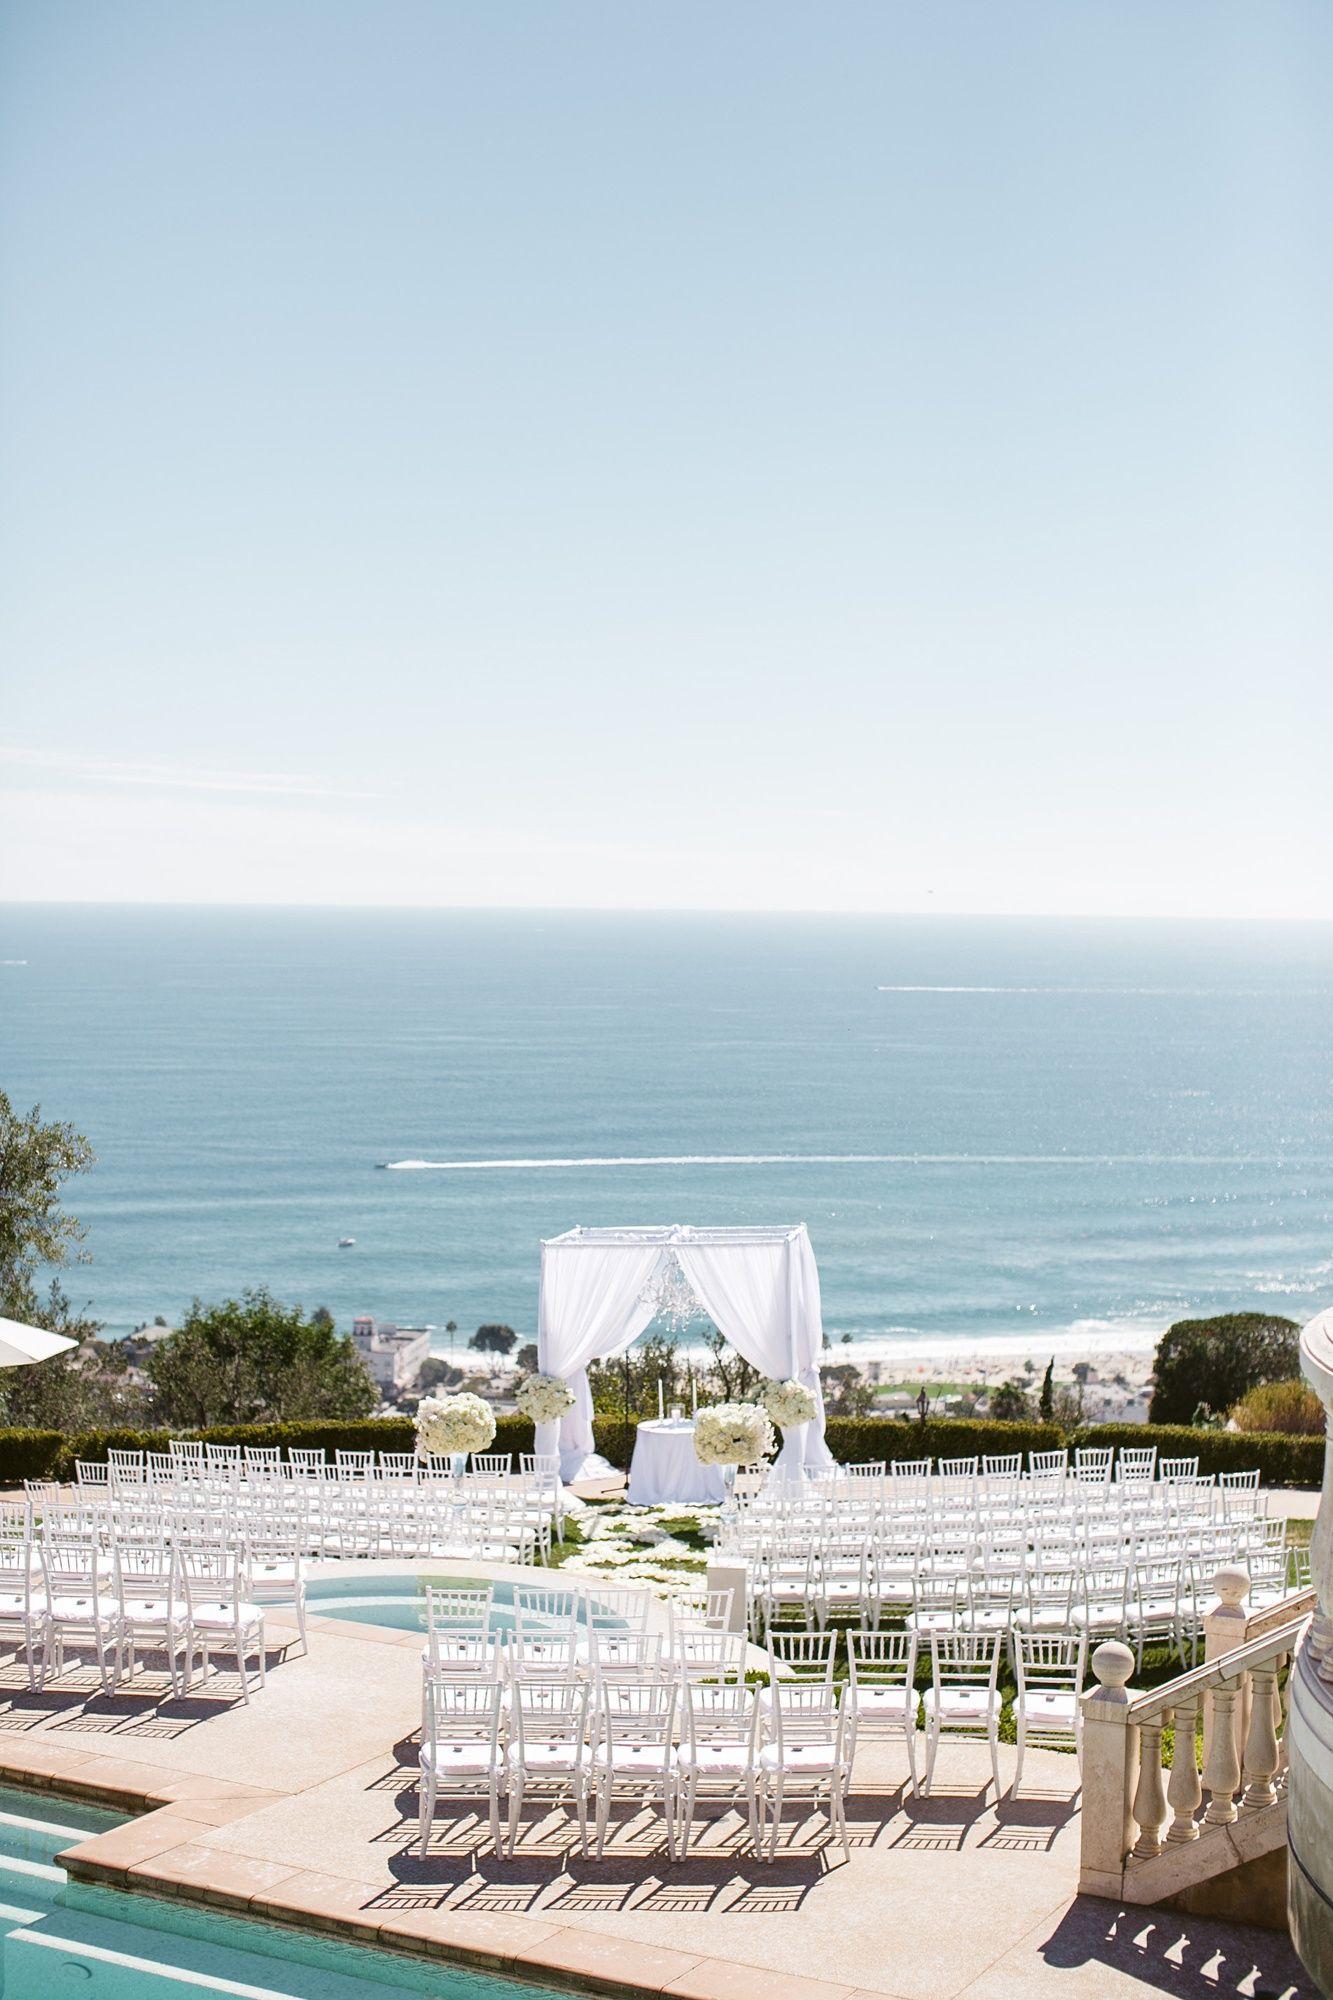 An Elegant Seaside Wedding at Oceana Estate in Laguna